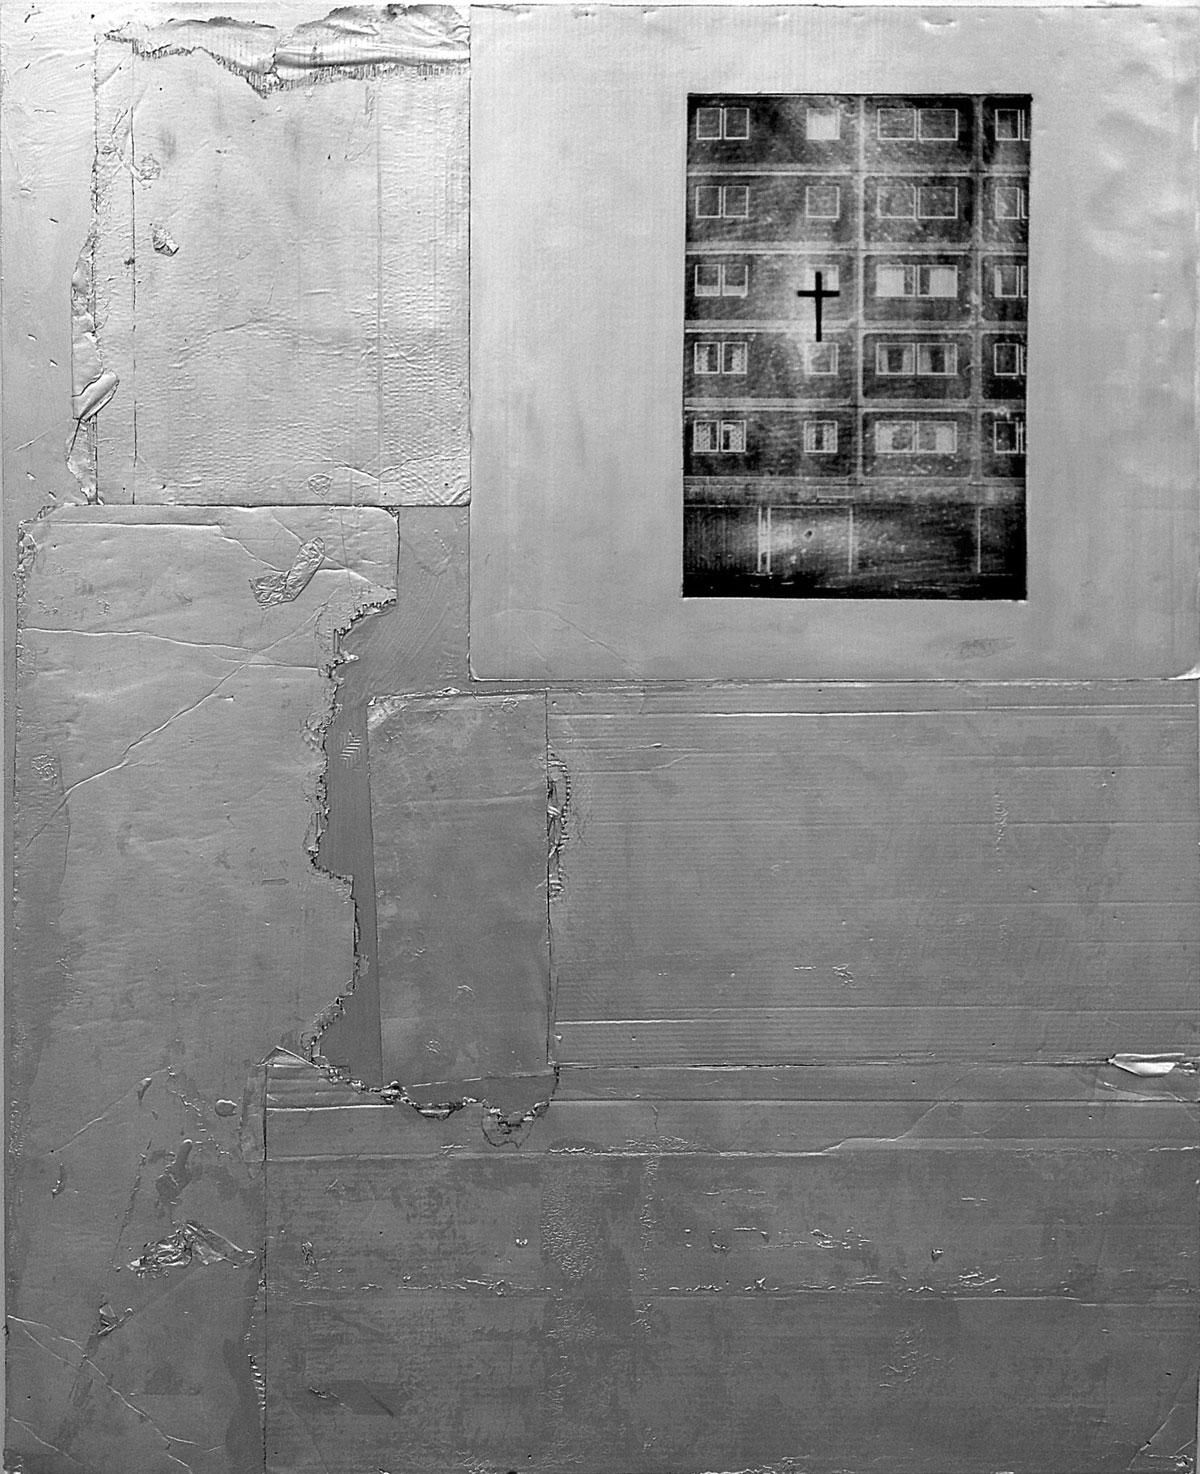 Opus 7:15, 2012, 165 x 134 cm. Cardboard, photo and acrylics on wood board.